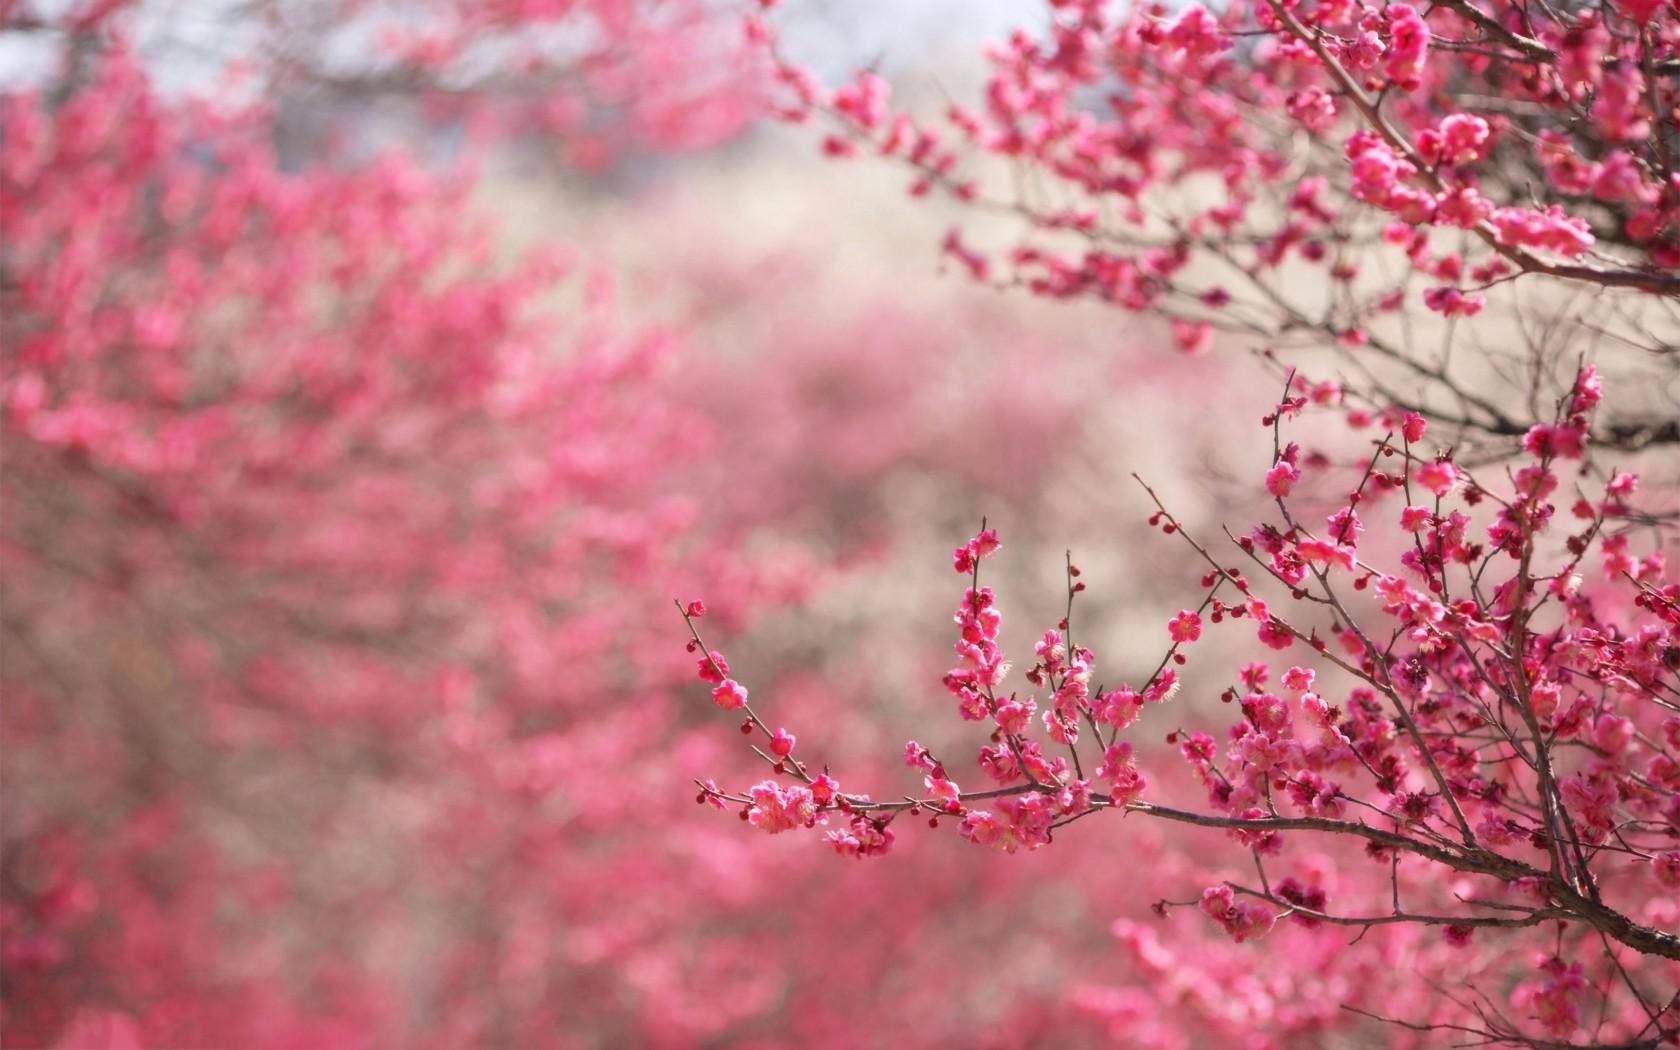 4k pink wallpapers high quality download free - Pink wallpaper 4k ...